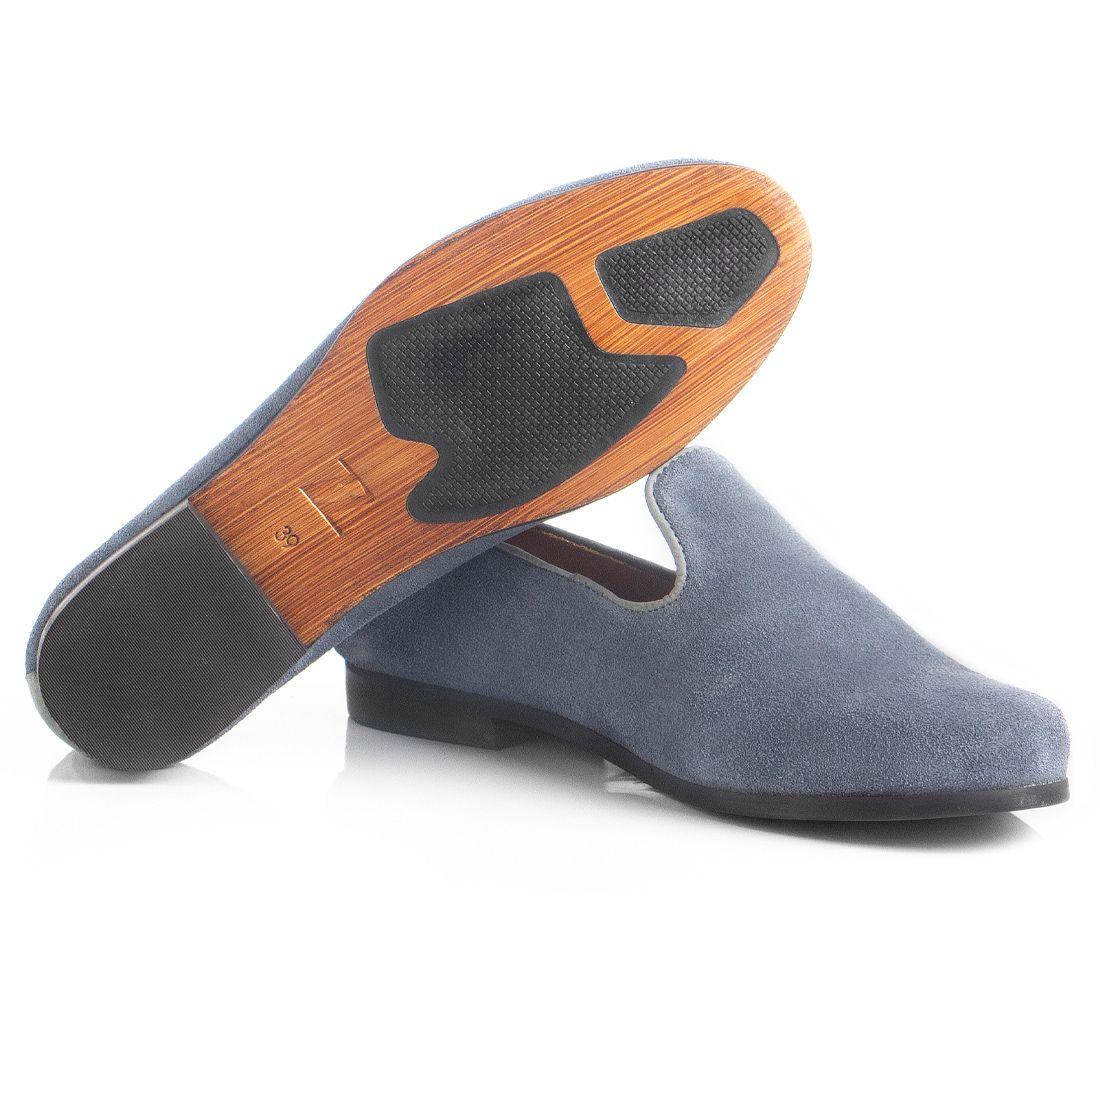 Loafer Masculino em Couro Camurça Cinza Rocco Lorenzzo - 4498